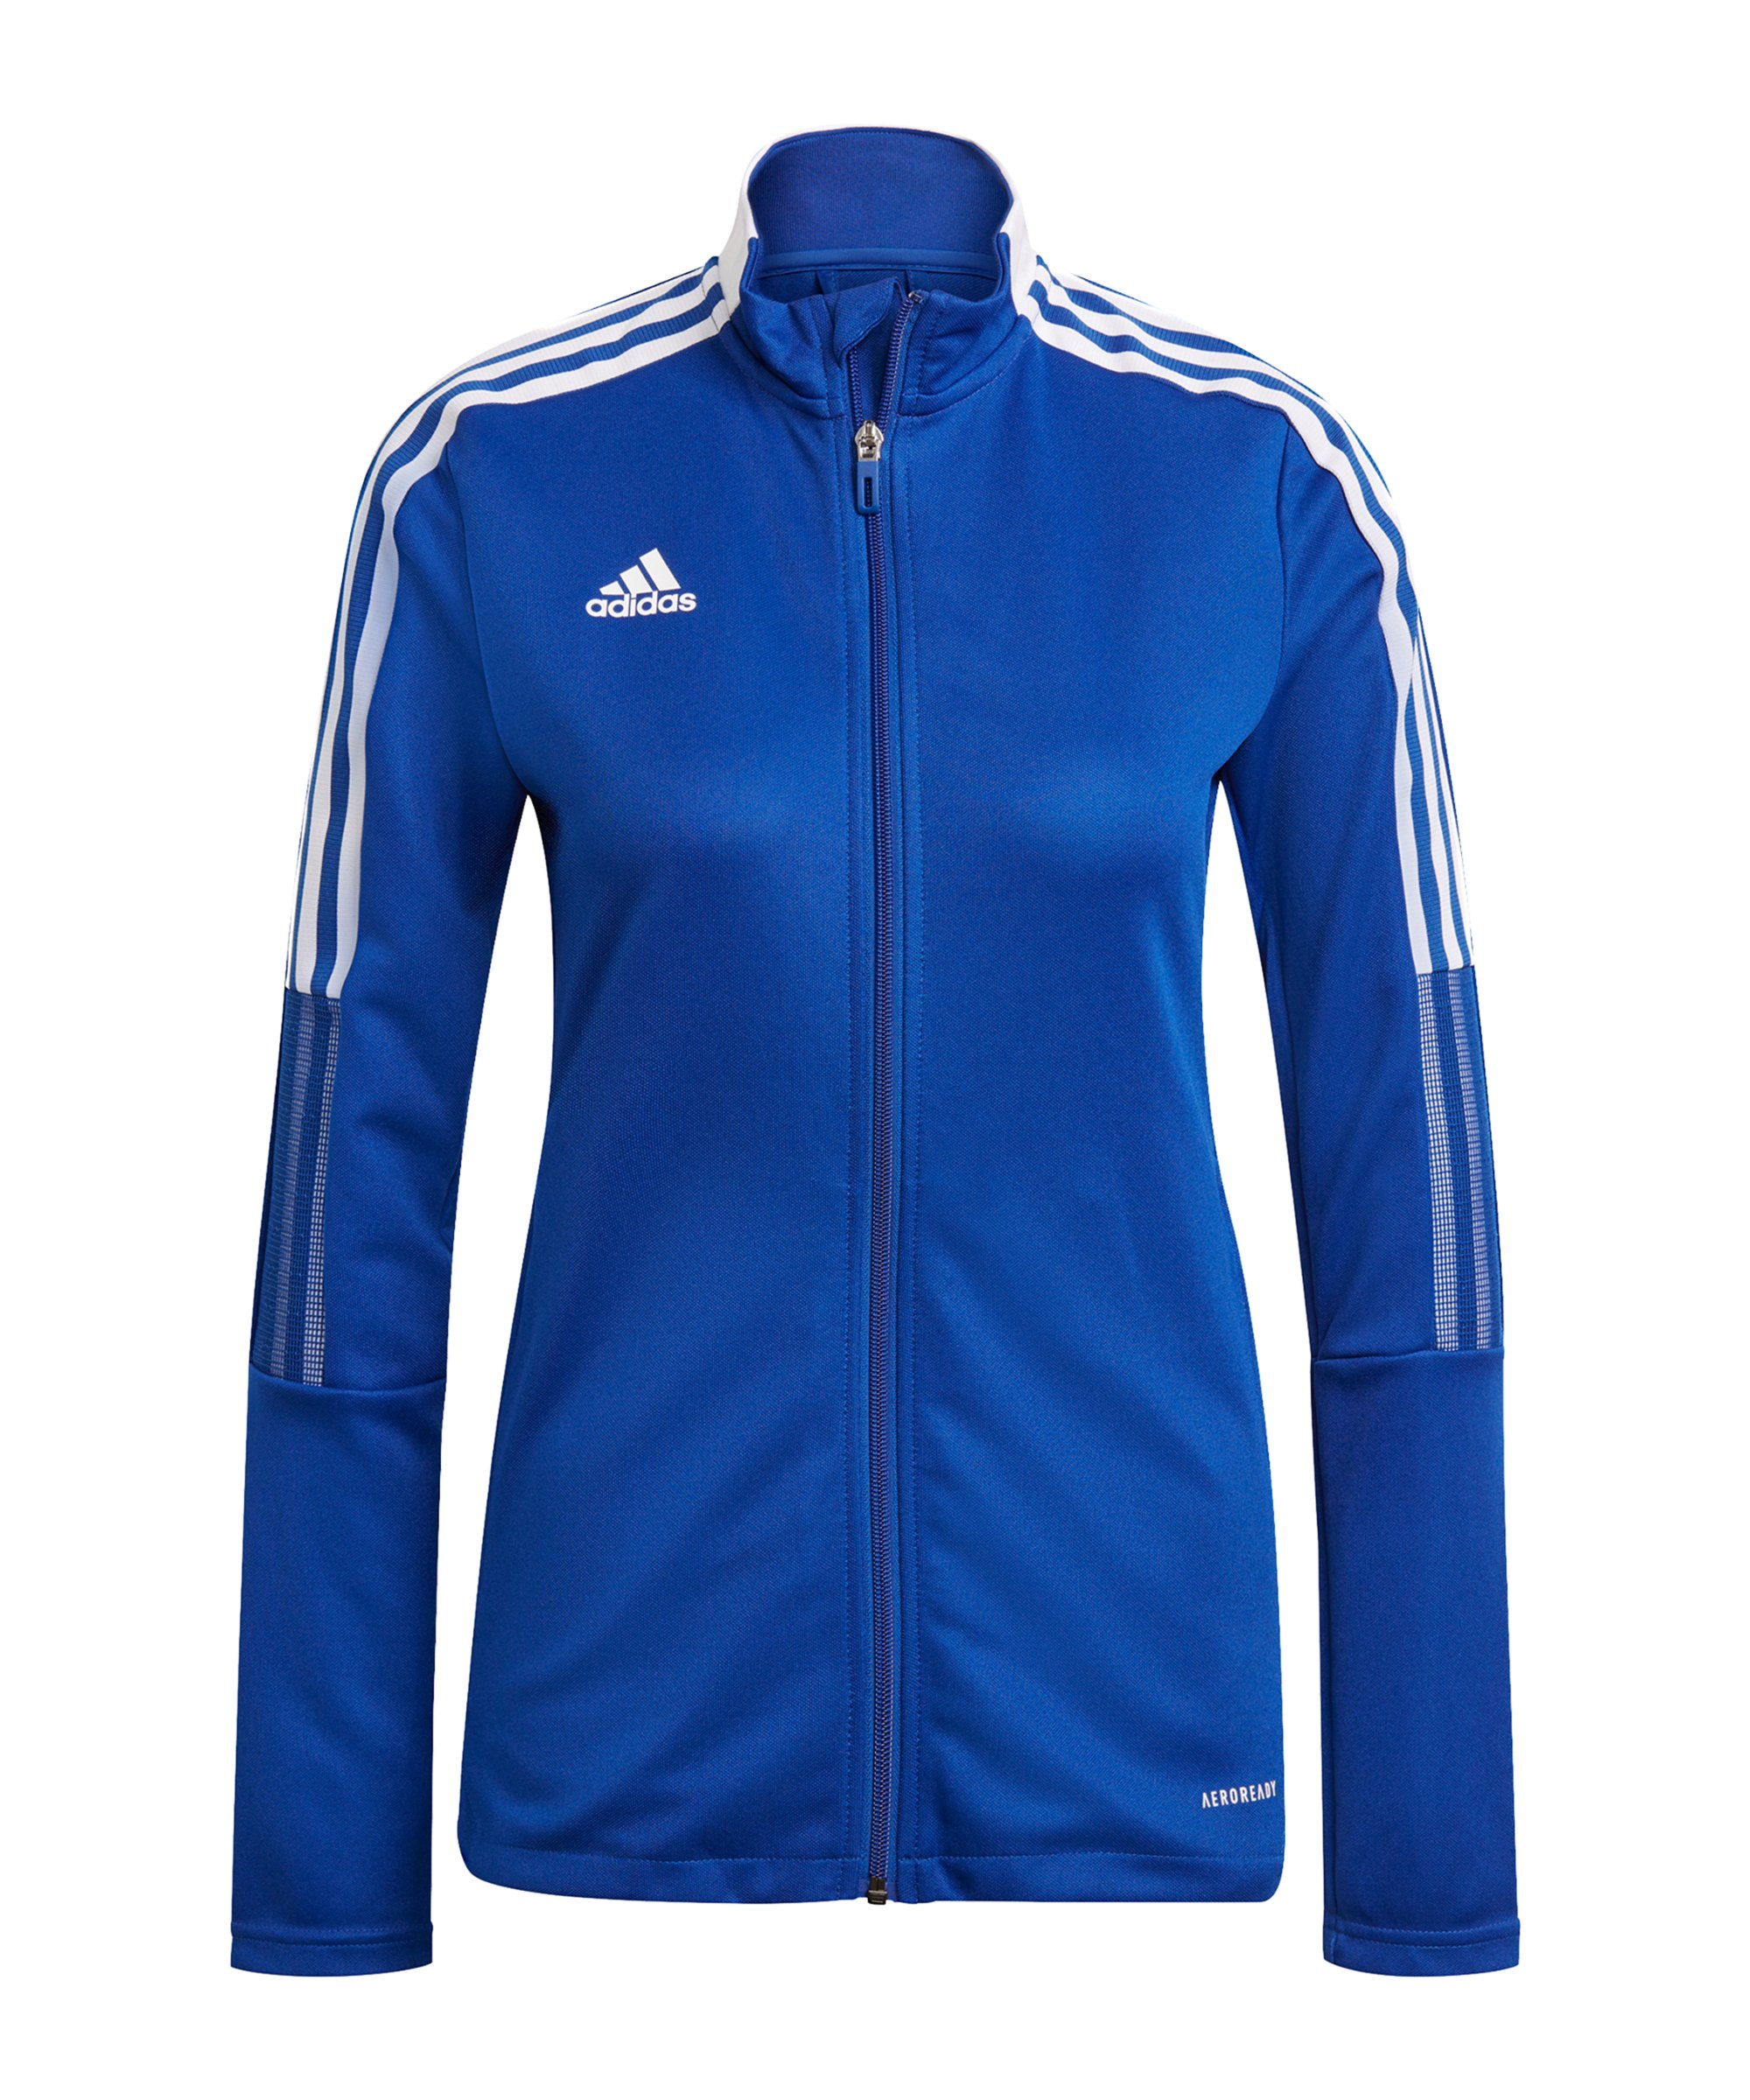 adidas Tiro 21 Trainingsjacke Damen Blau - blau